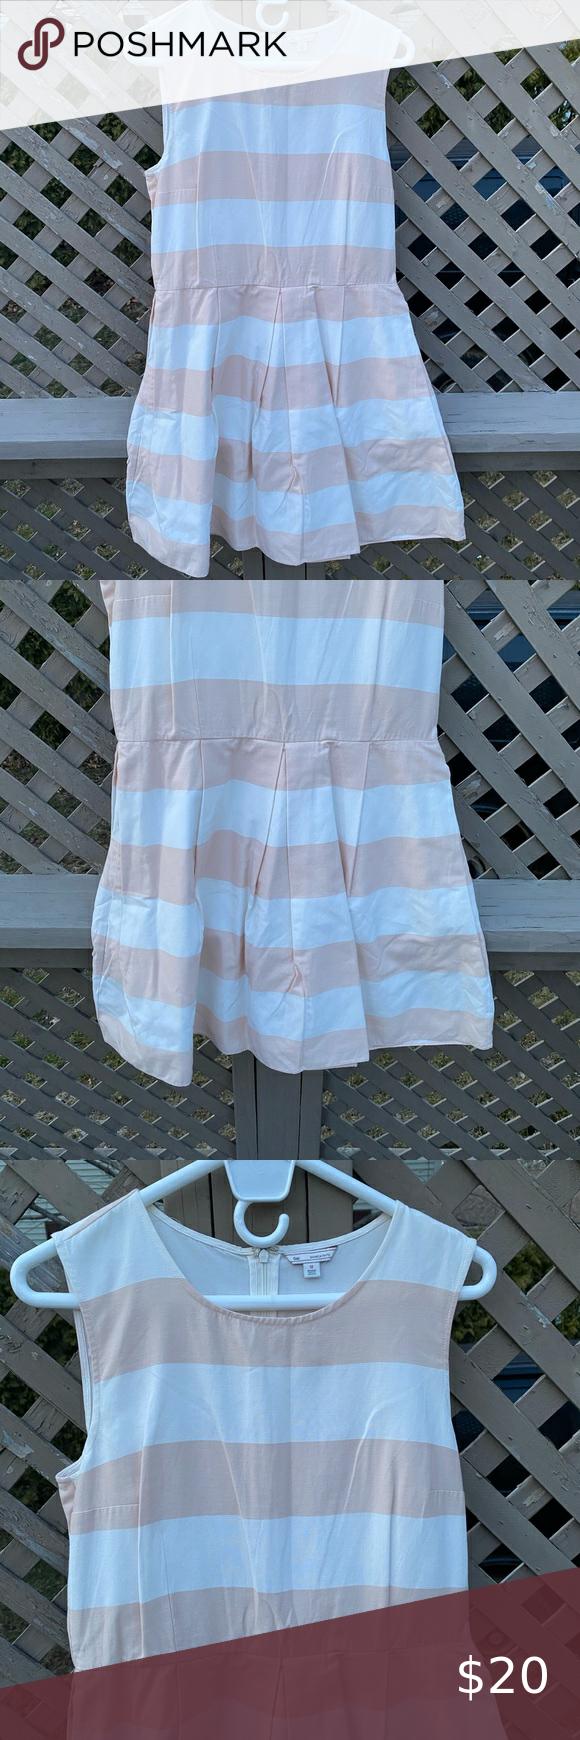 Gap Striped Summer Dress Size 12 In 2020 Striped Dress Summer Summer Dresses Light Summer Dresses [ 1740 x 580 Pixel ]